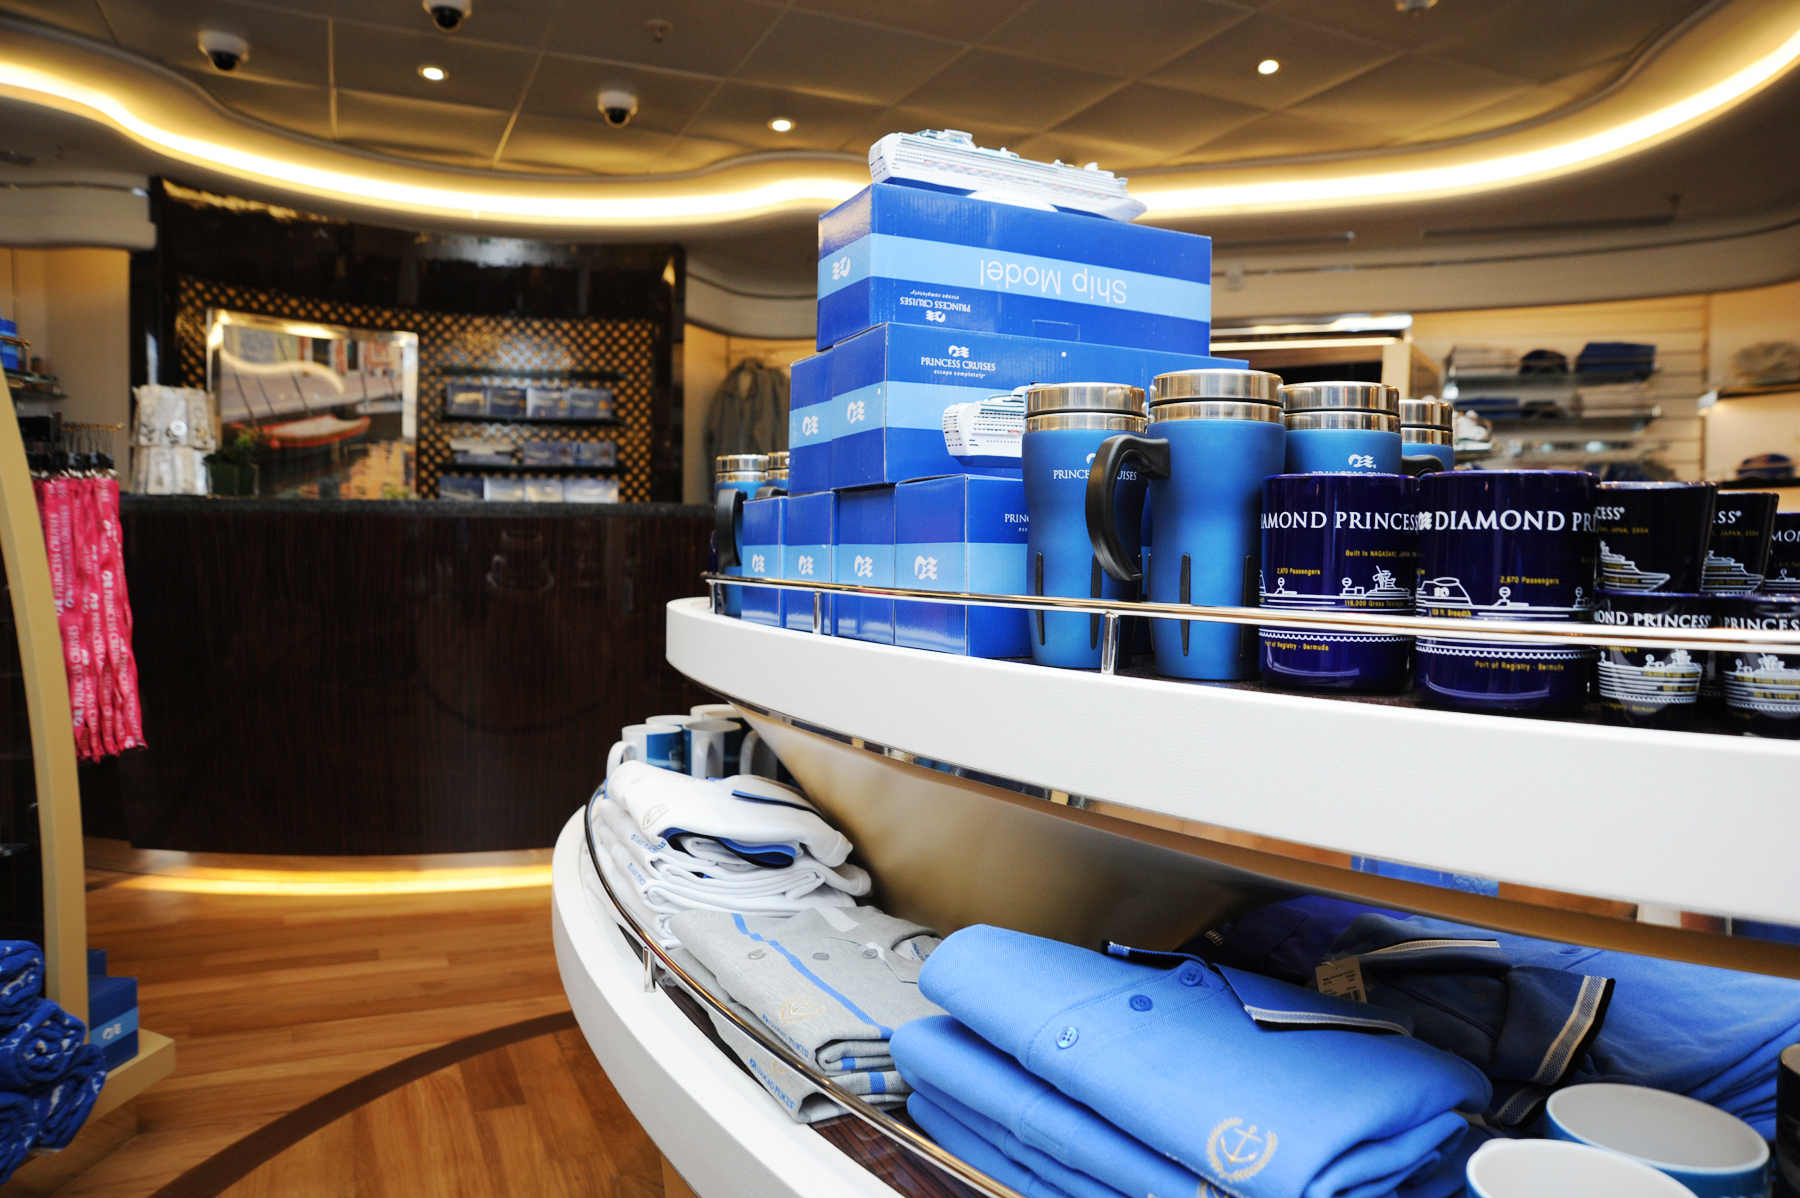 Princess Cruises Royal Class Interior shop 2.jpg